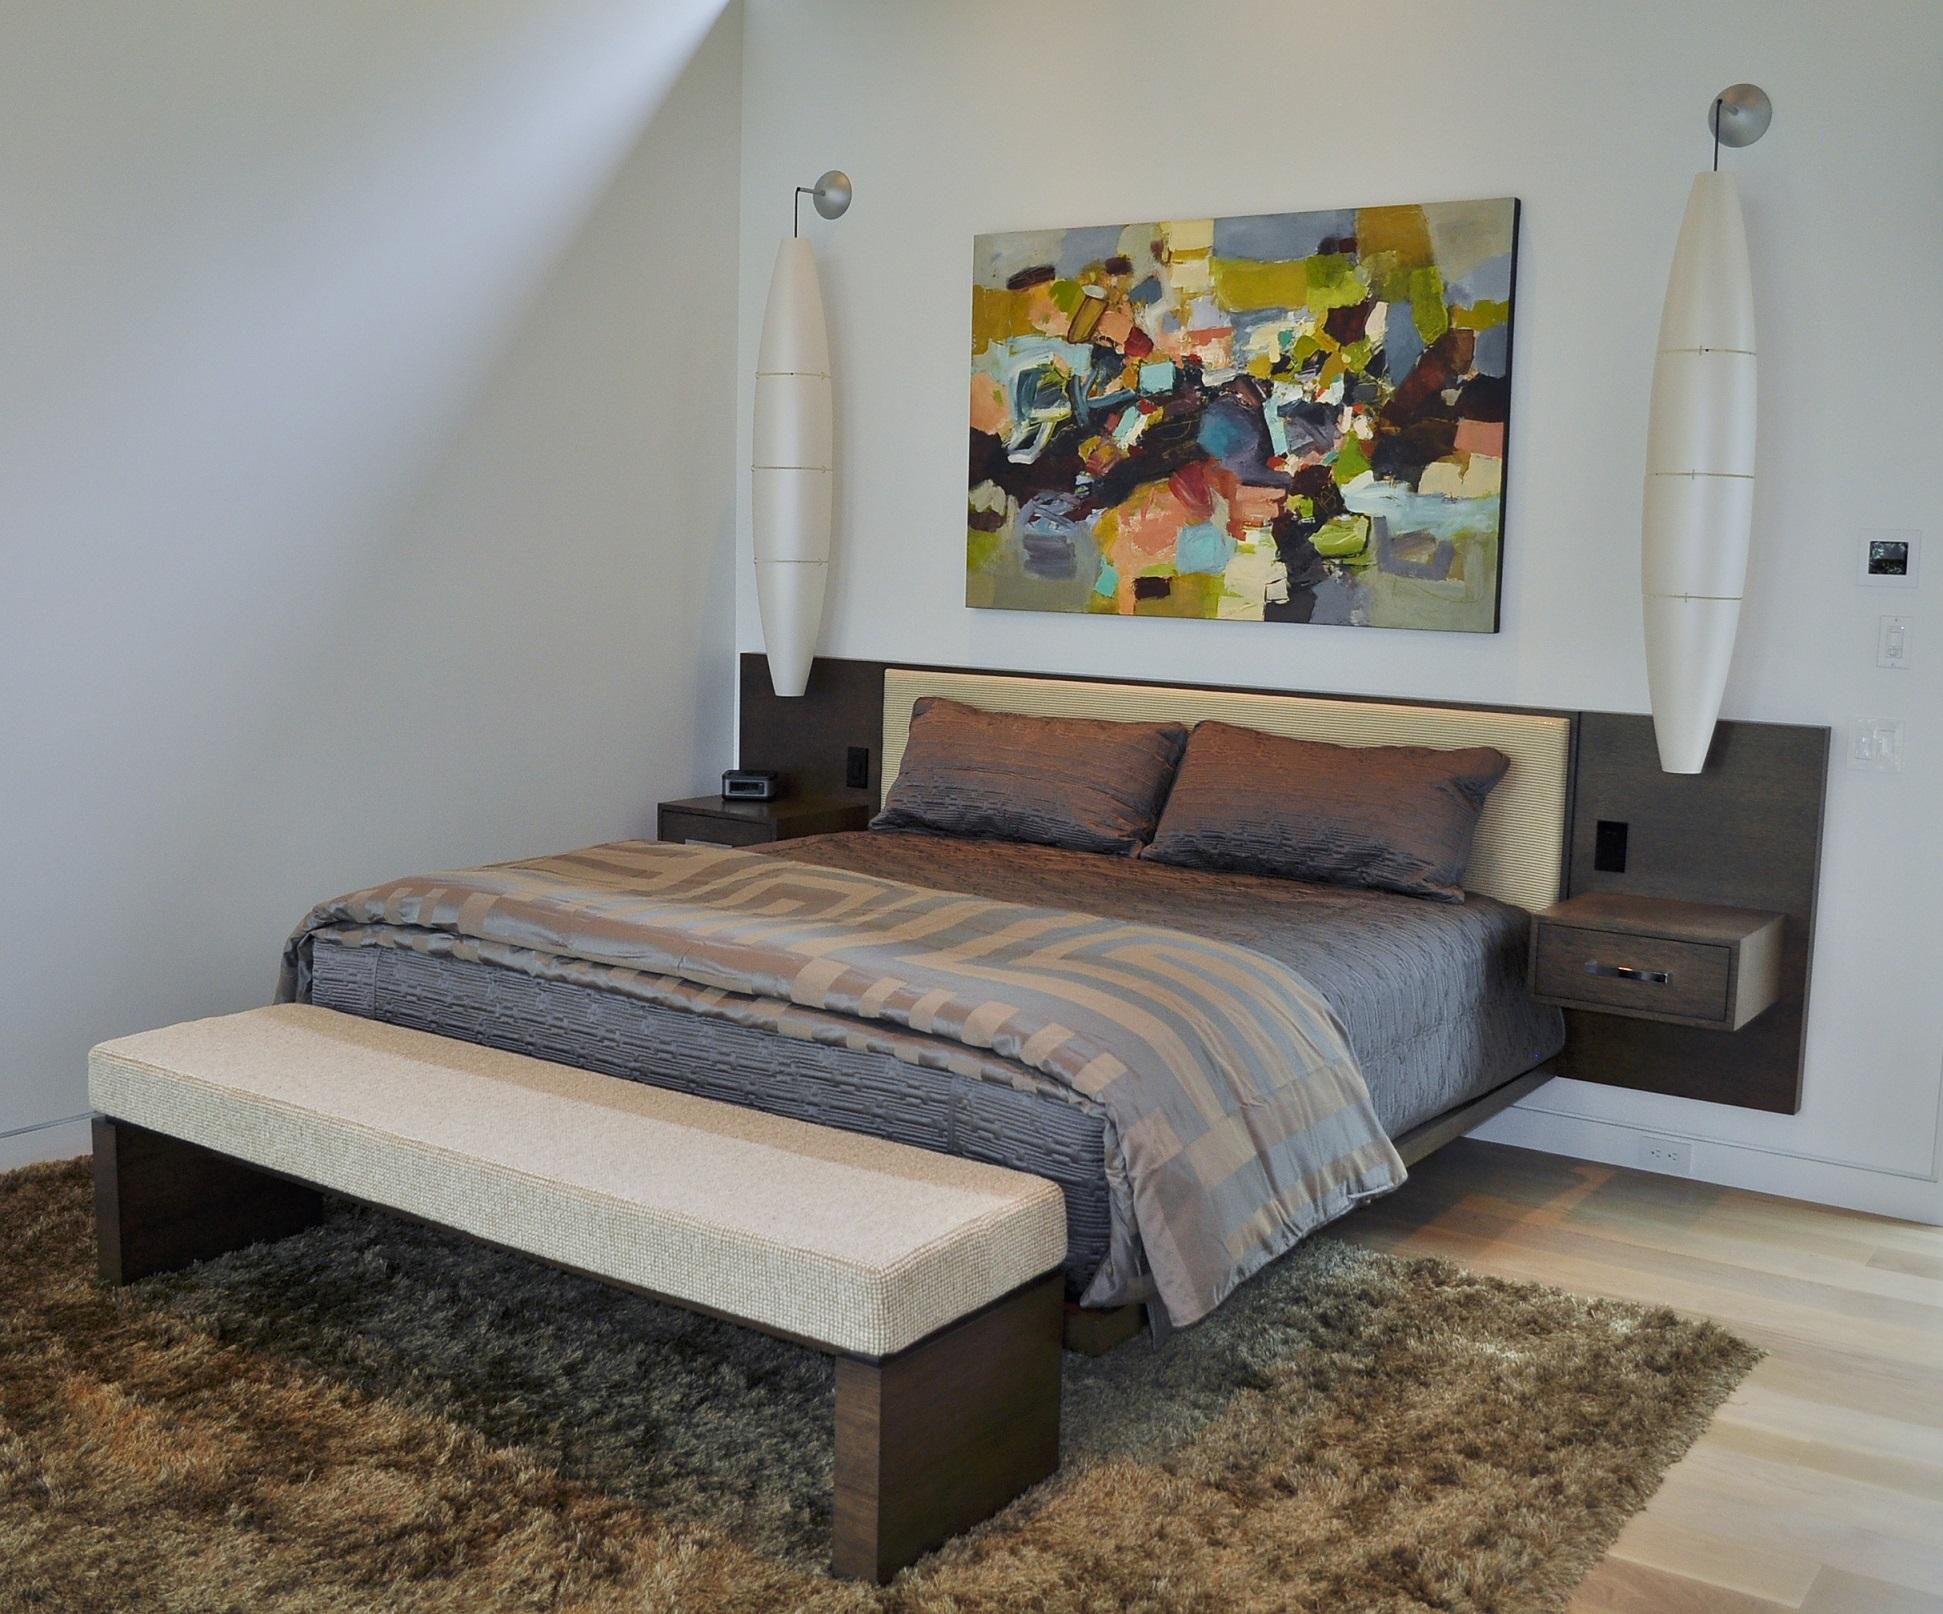 wall-mounted-wood-headboard-and-nightstands.JPG